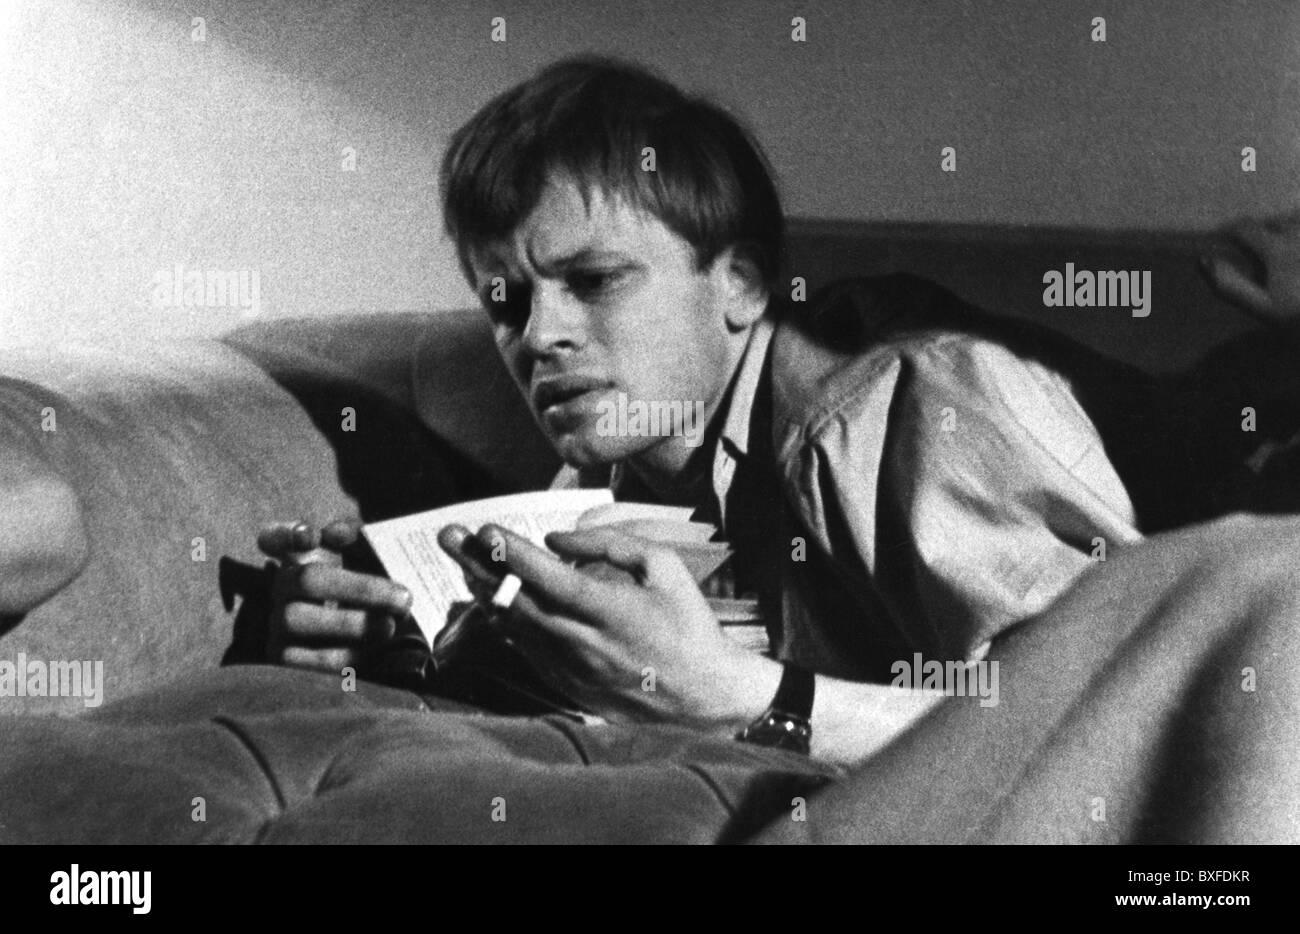 Kinski, Klaus, 18.10.1926 - 23.11.1991, acteur allemand, lire 'l'Idiot de Fiodor Dostoïevski, Berlin, Photo Stock